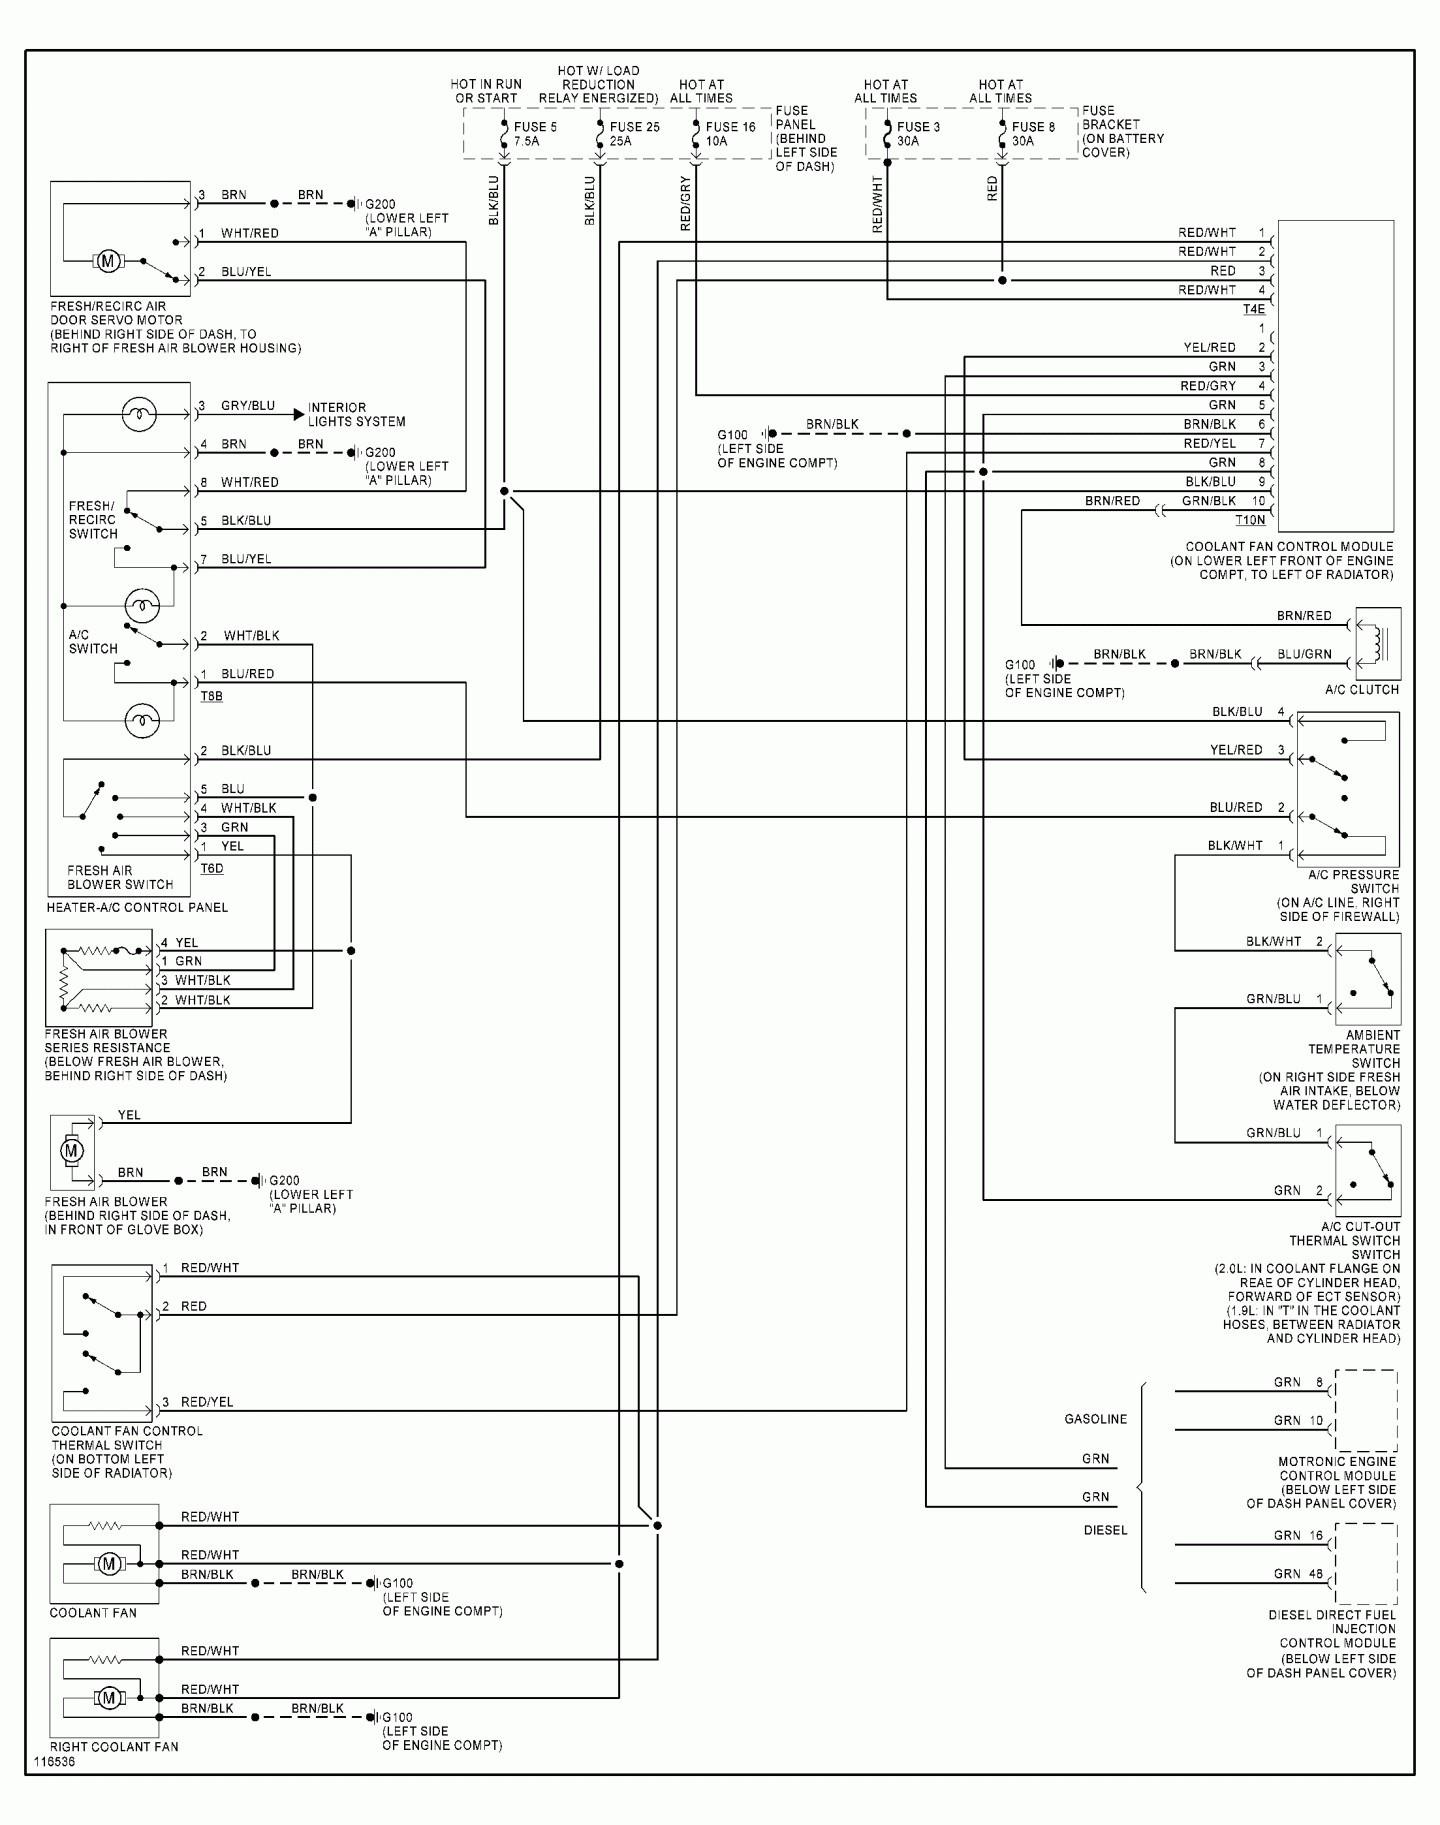 2003 Vw Jetta Engine Diagram Vw Jetta Wiring Diagram Wiring Diagram Of 2003 Vw Jetta Engine Diagram